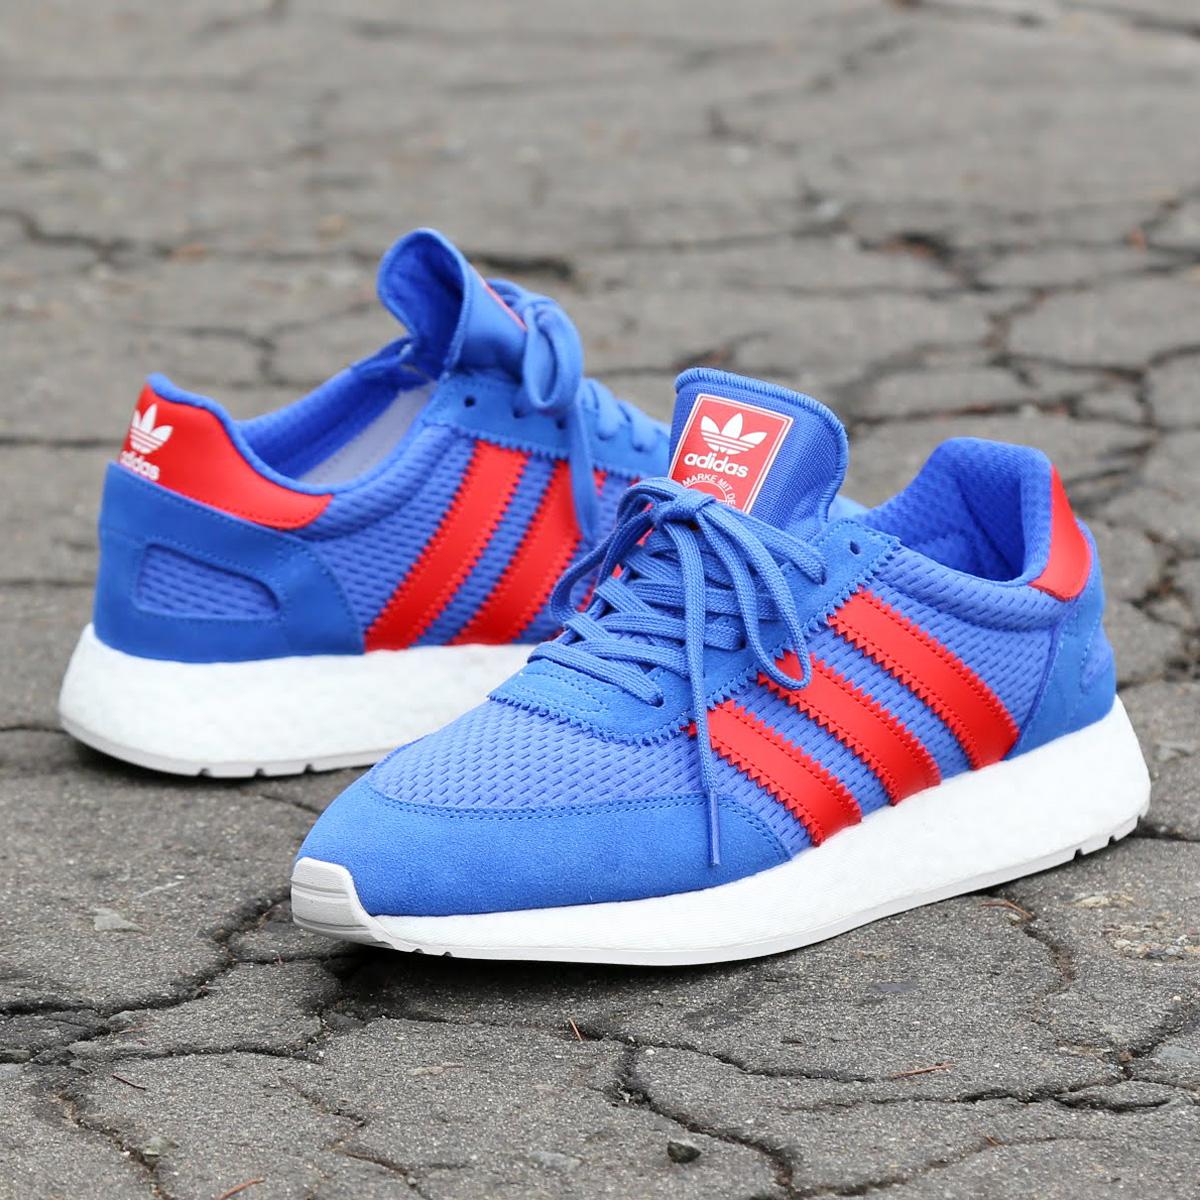 adidas Originals I-5923(アディダス オリジナルス I-5923)Hi-Res Blue/Red/Grey One【メンズ スニーカー】18FW-I